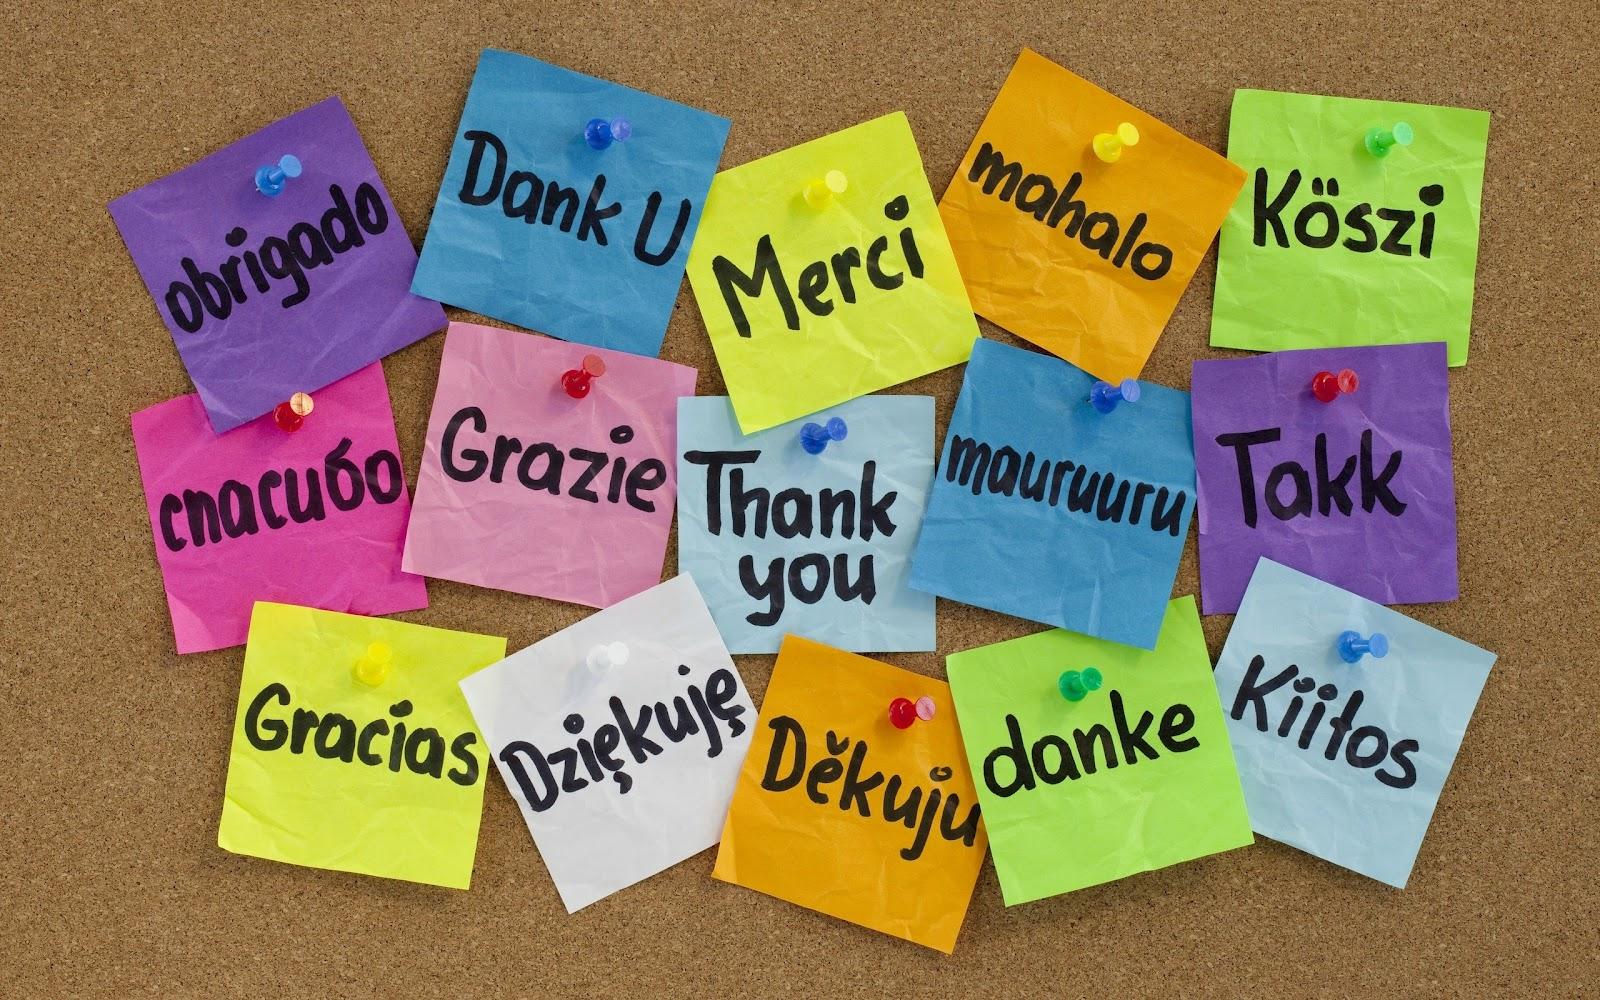 http://www.healthytravelblog.com/wp-content/uploads/2013/12/Thank-you-post-it_Xoombi.jpg